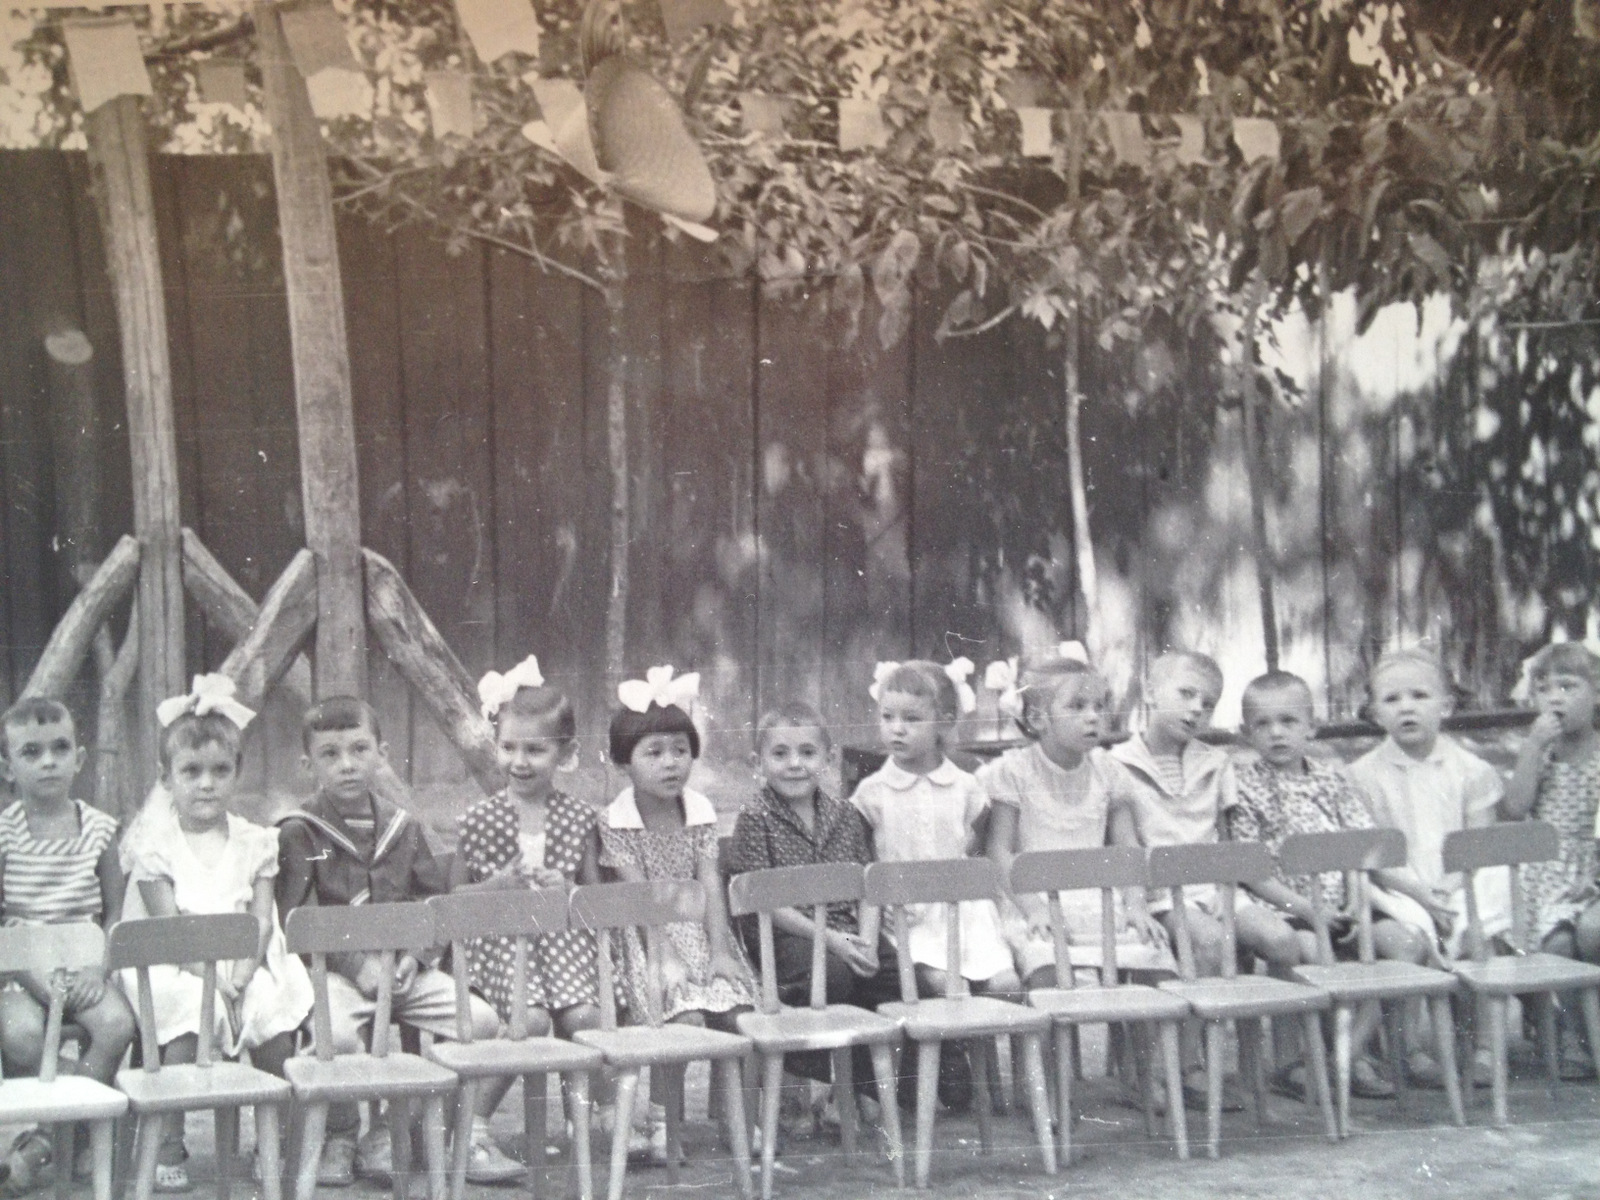 My Mom, a half-Korean child among multi-ethnic kids from all over Soviet Unionin a Tashkent kindergarten in the early 1960s.